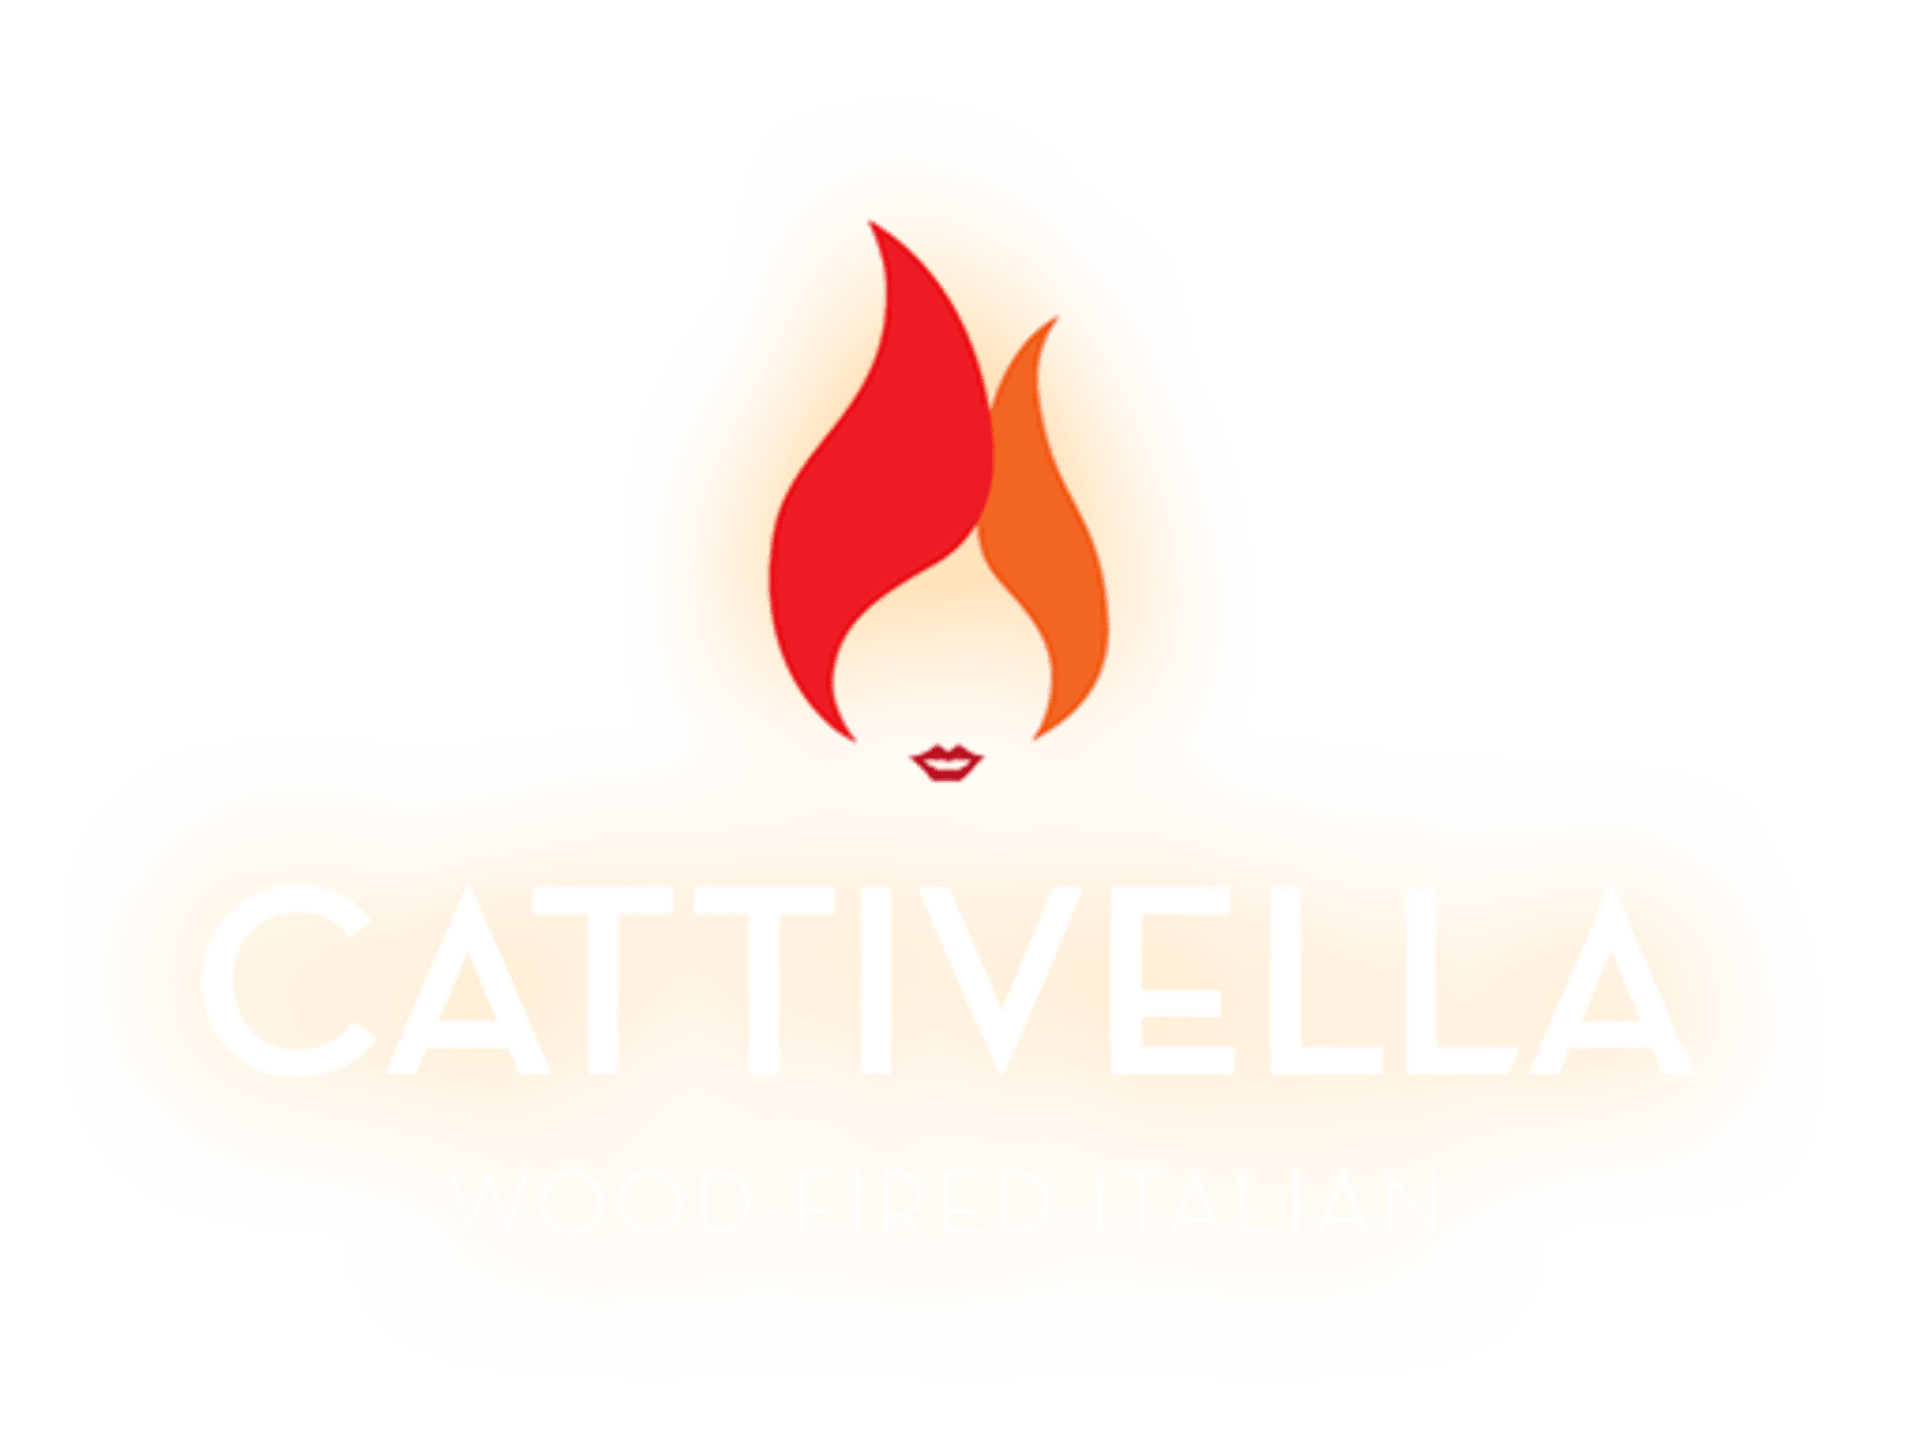 Cattivella Wood-Fired Italian